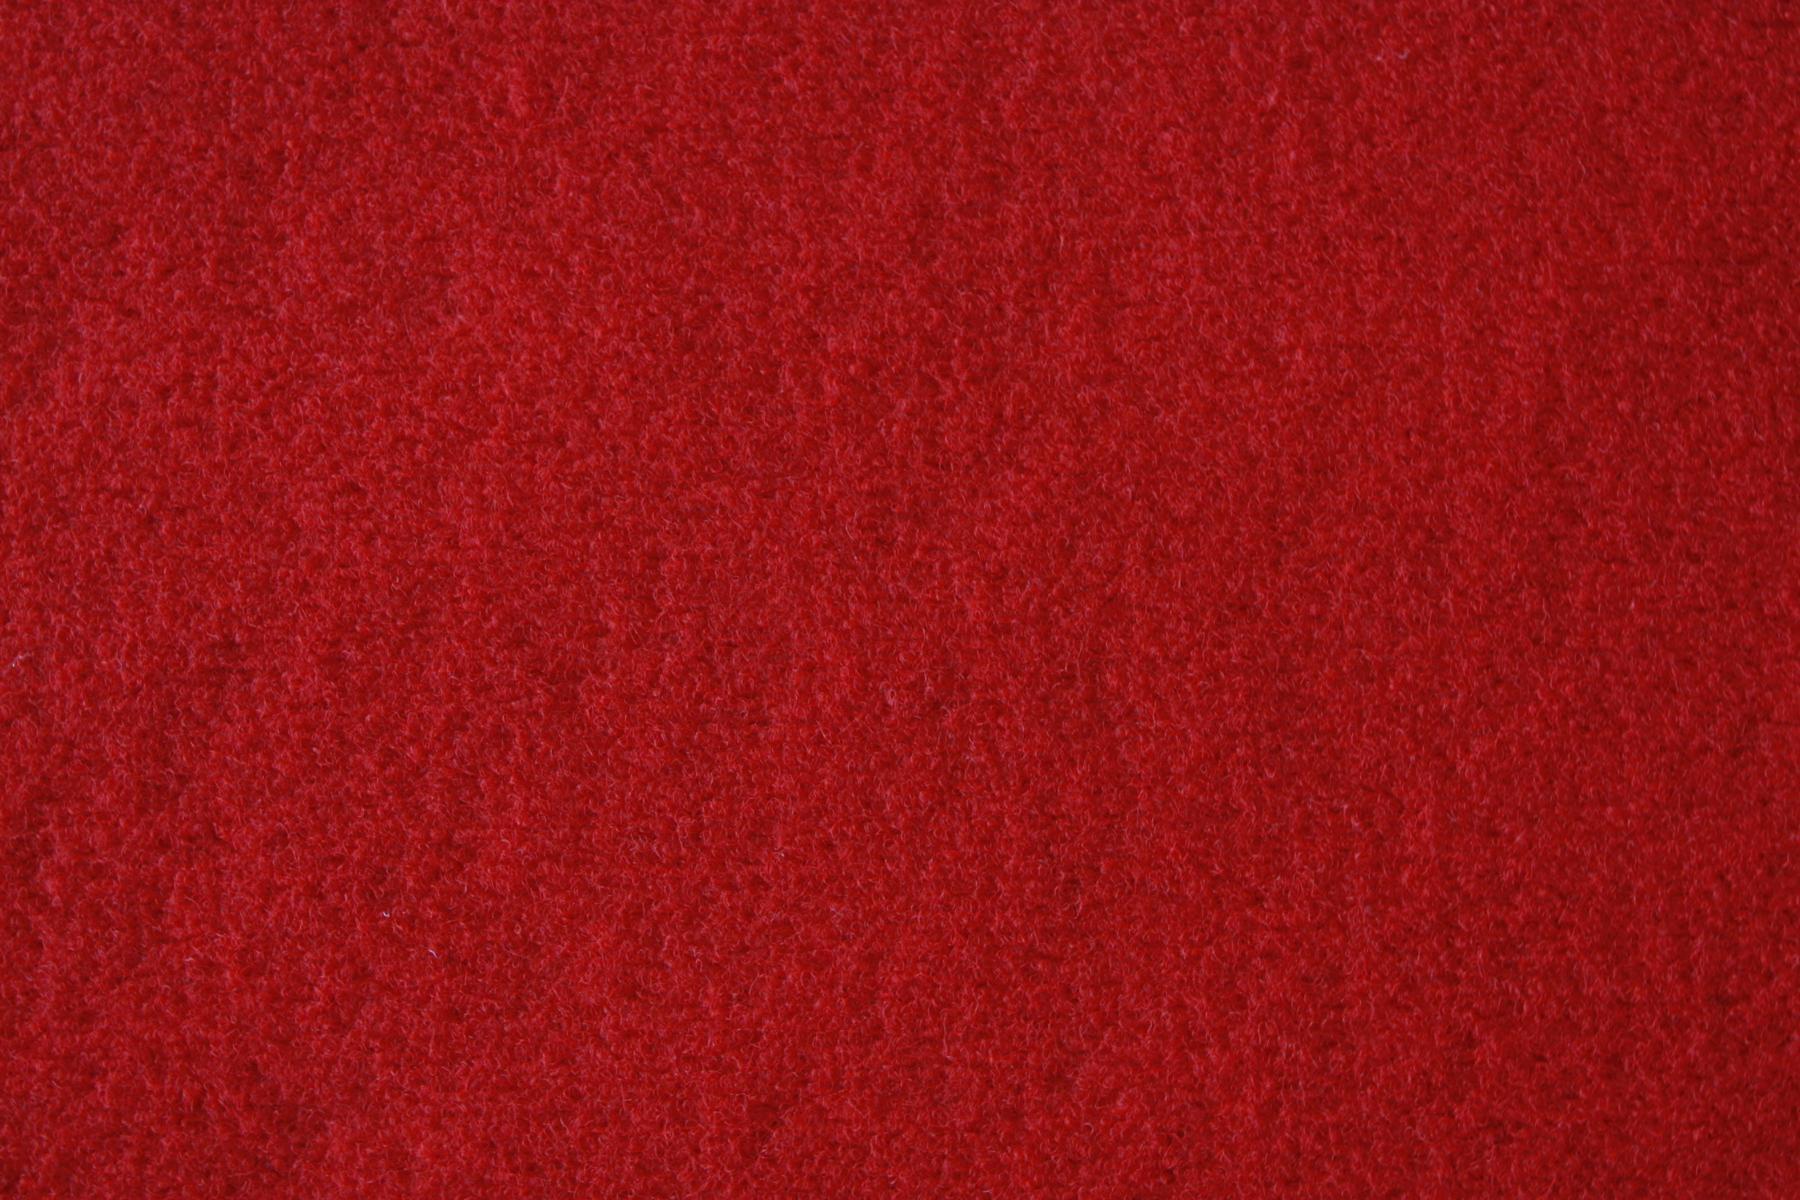 Alfombra de c sped artificial b sico rojo 200x300 cm ebay - Alfombra 200x300 ...